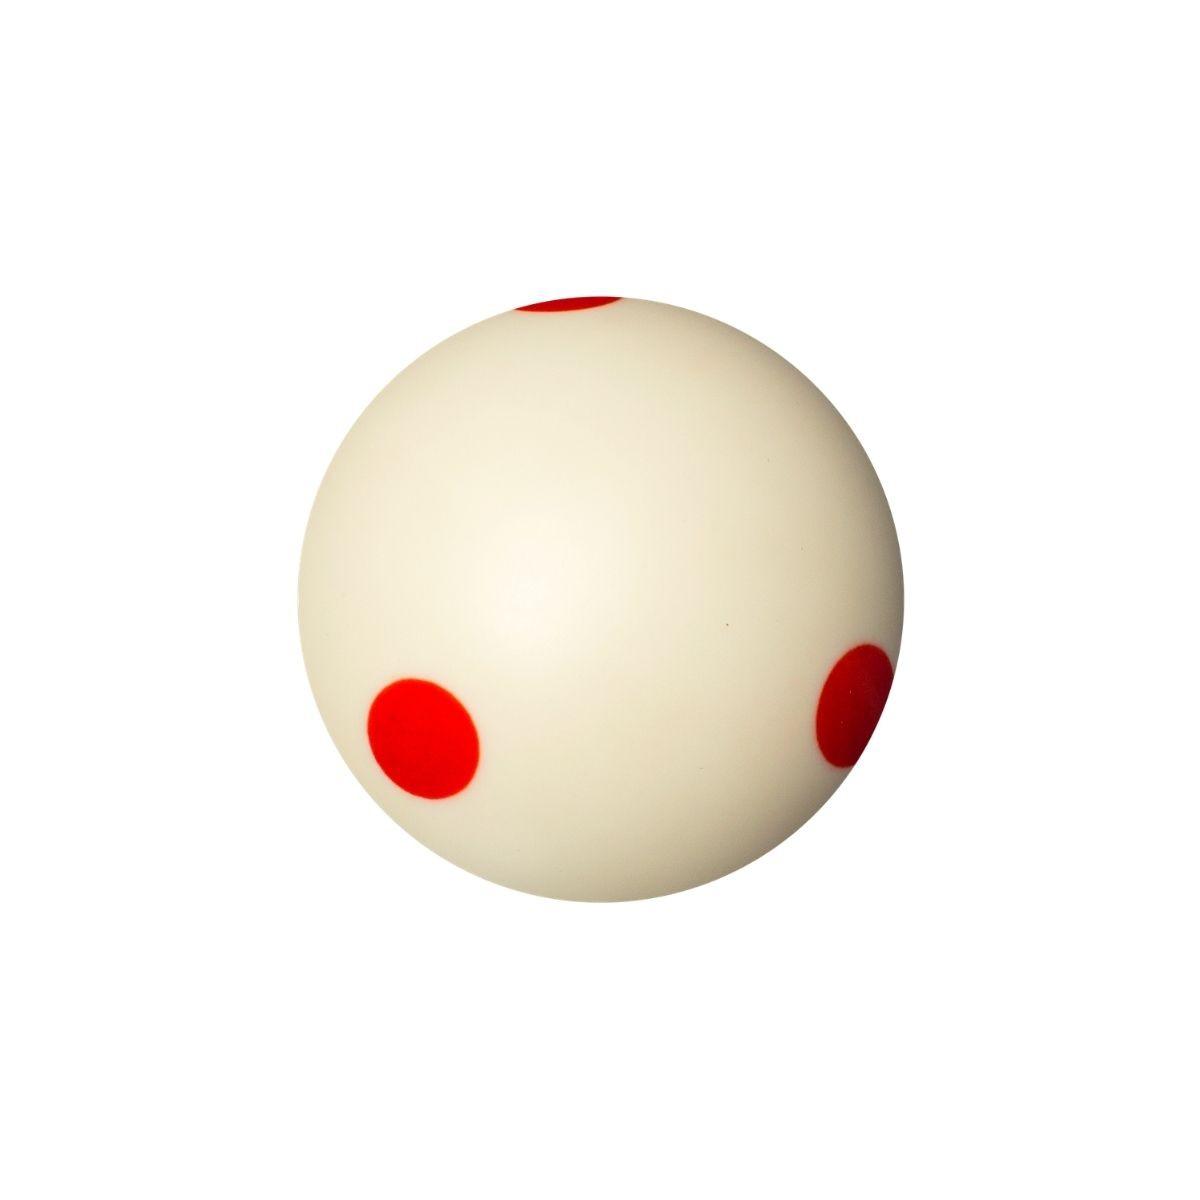 Bola de Treino Six Red Points 57mm para Bilhar Sinuca